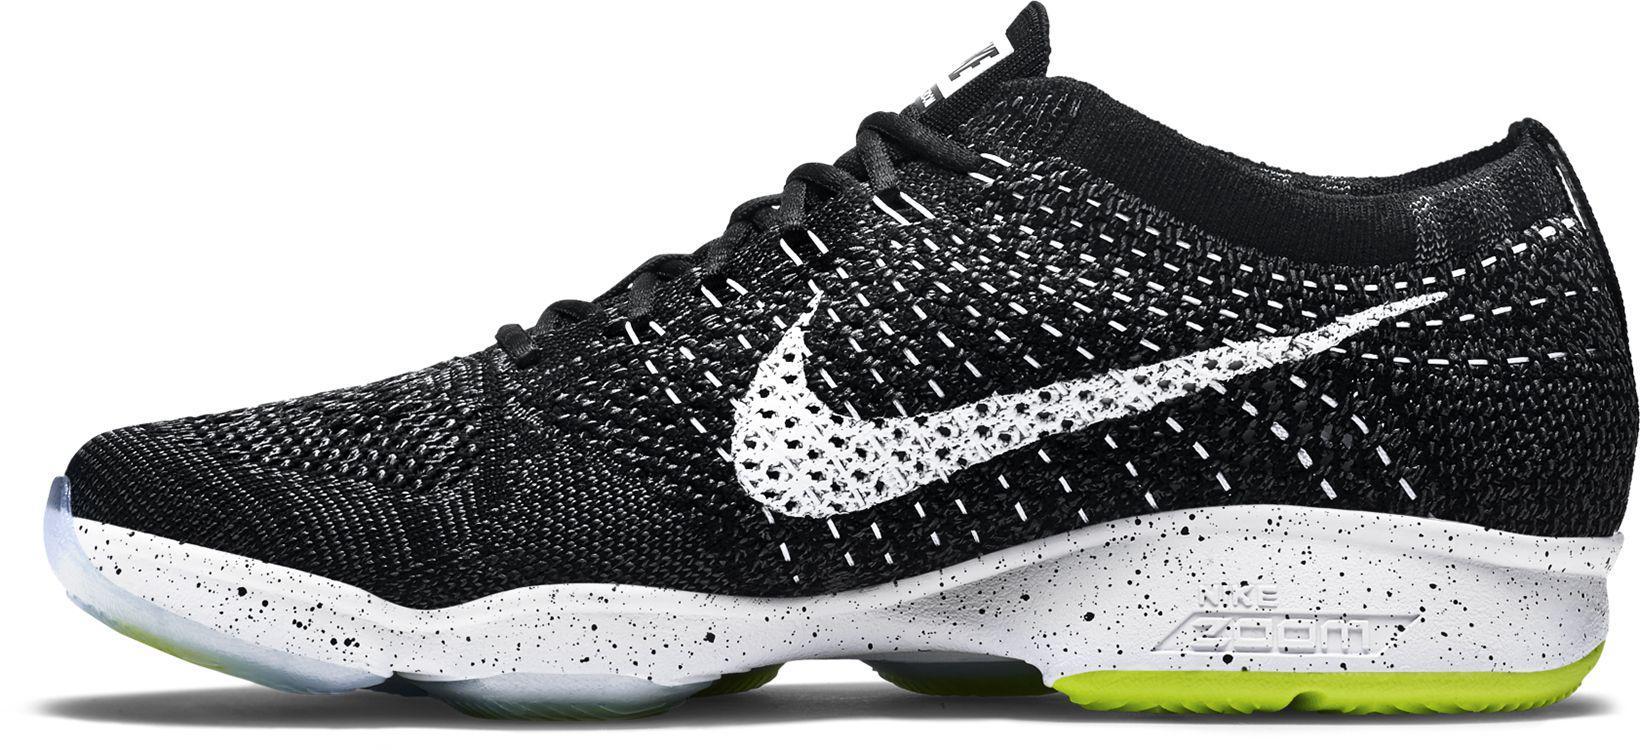 Corta vida Moler curva  Nike Rubber Flyknit Zoom Fit Agility Training Shoes for Men - Lyst